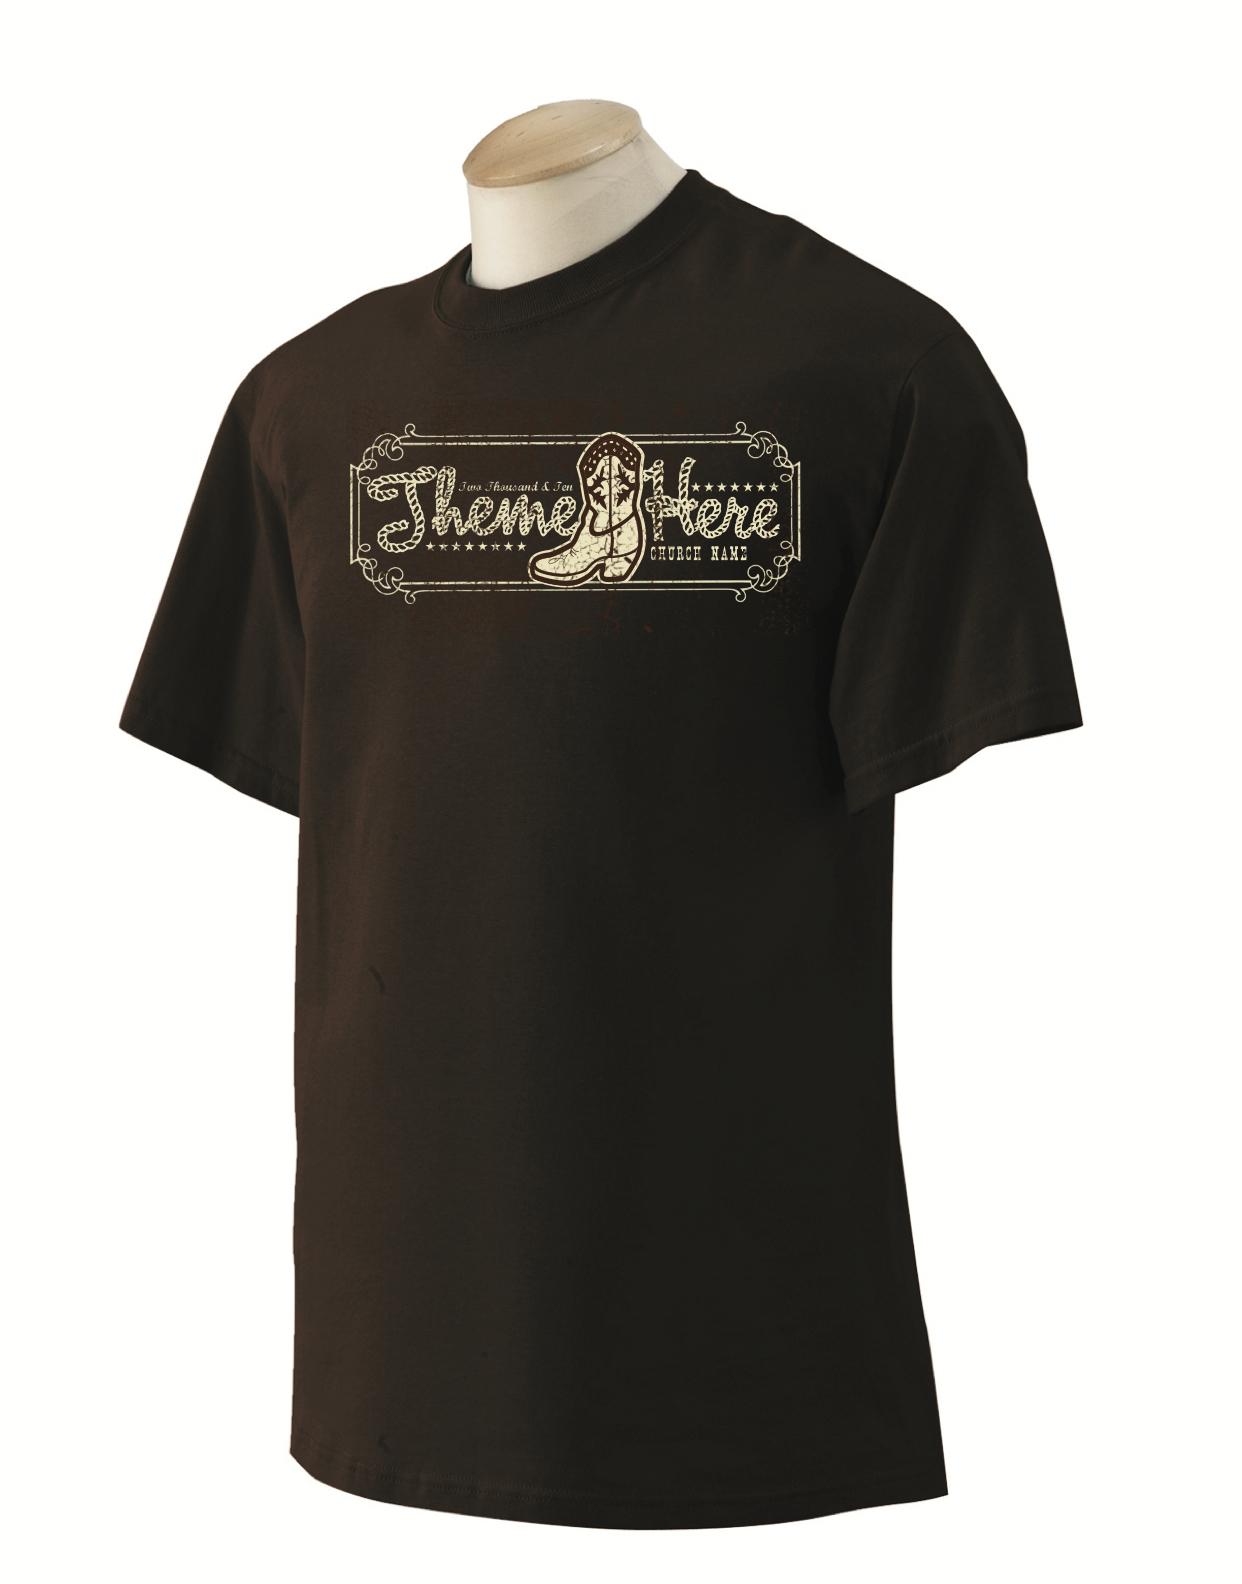 ranch 2 brown shirt.jpg